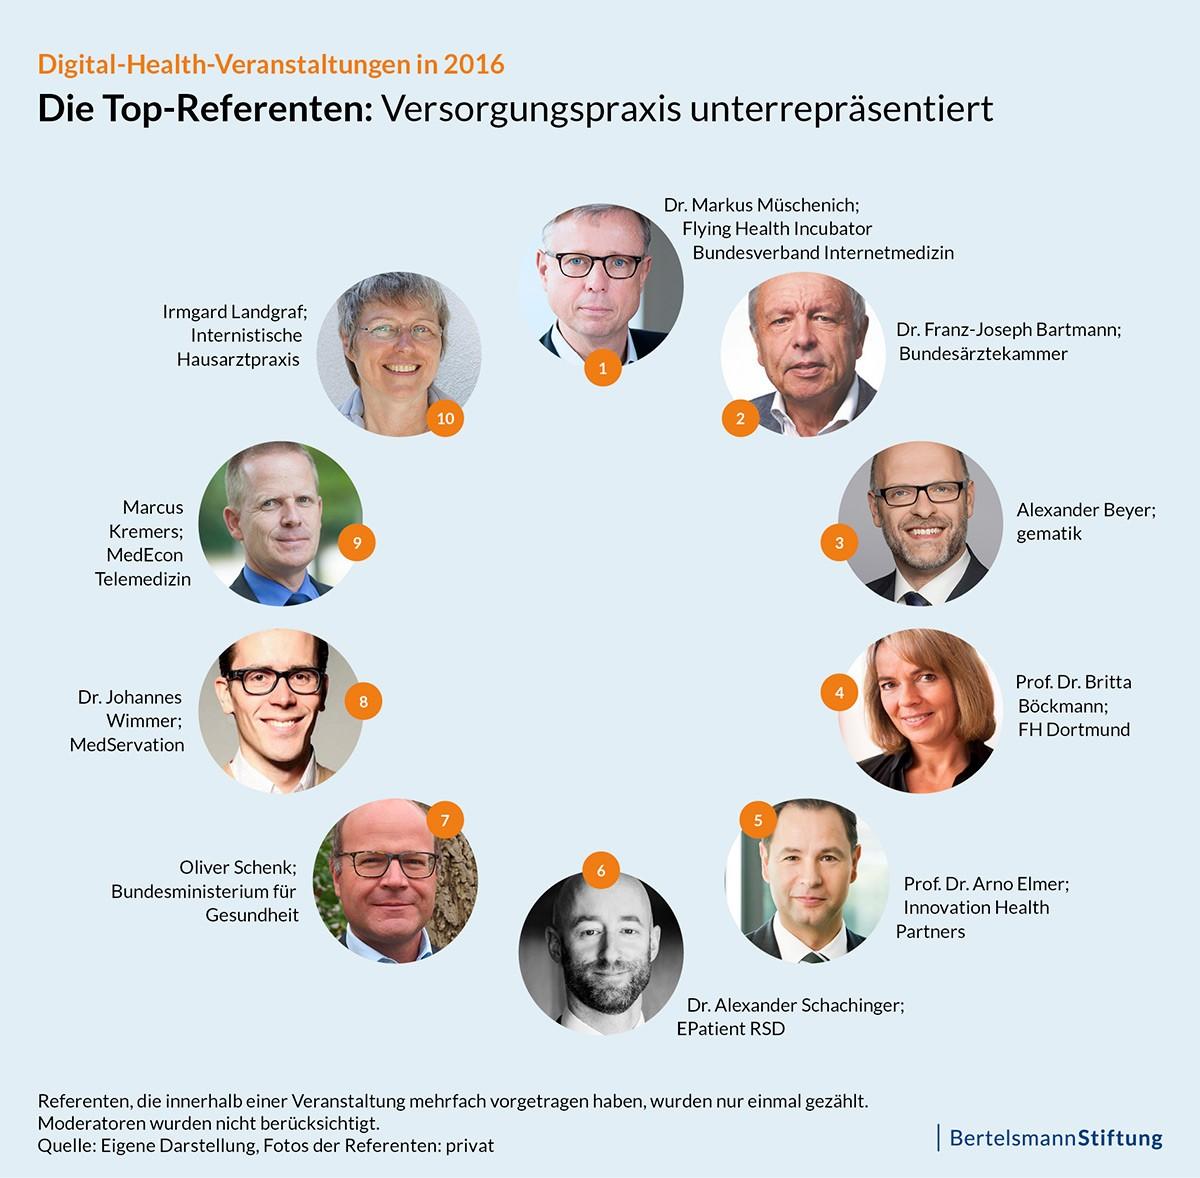 Die Top-Referenten: Versorgungspraxis unterrepräsentiert